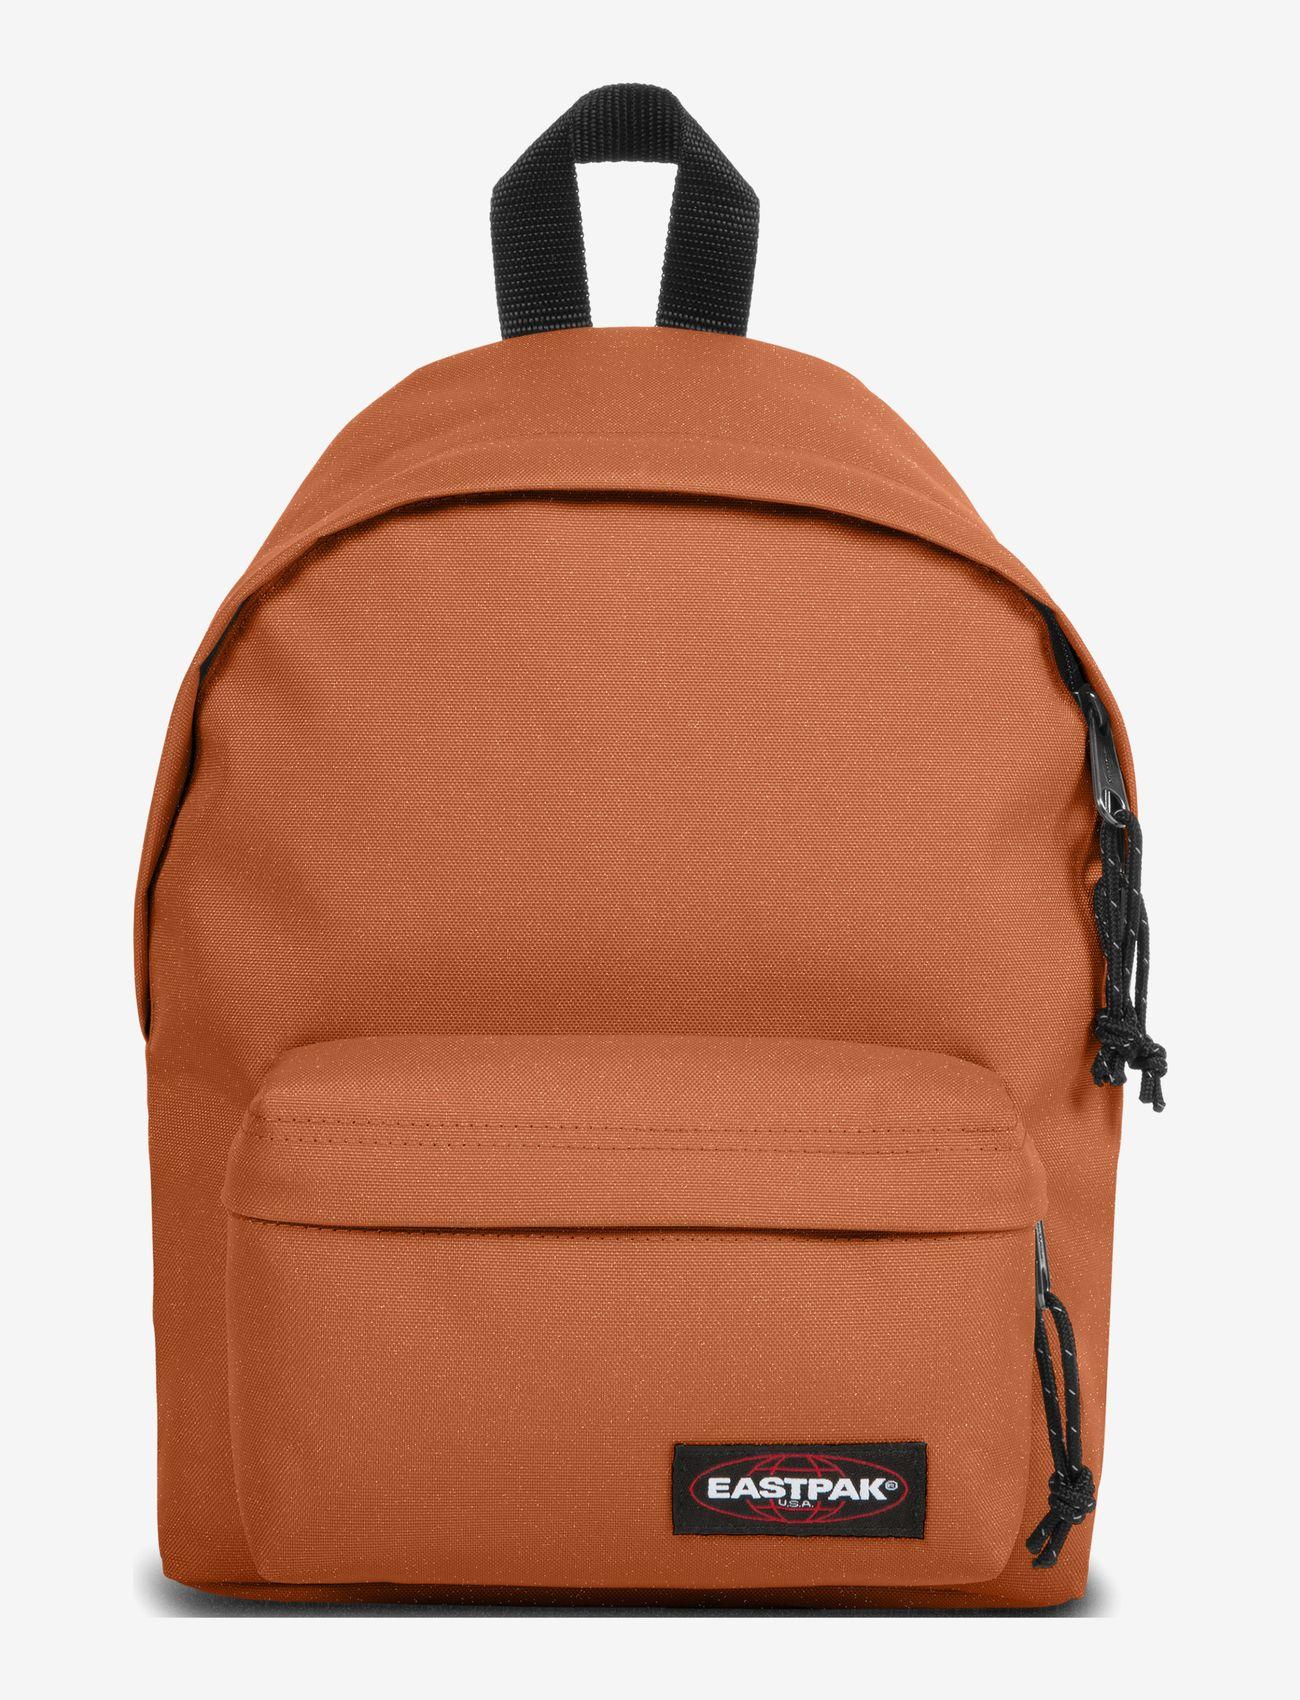 Eastpak - ORBIT - rucksäcke - metallic copper - 0